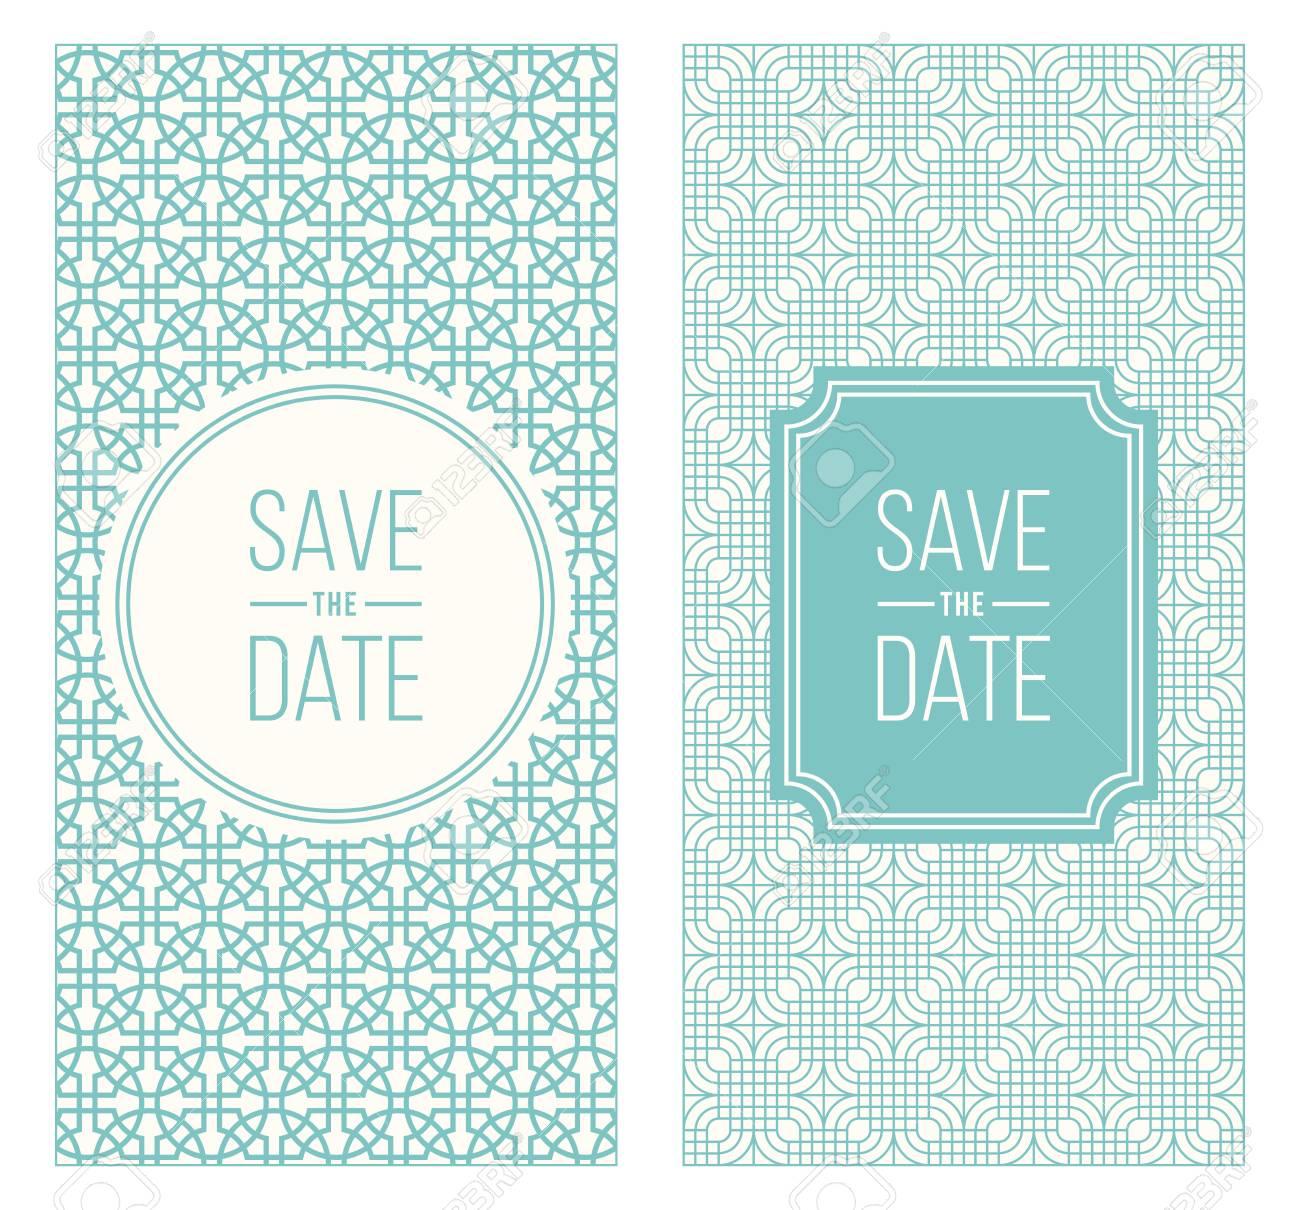 Two Retro Vintage Wedding Invitation Templates Abstract Geometric